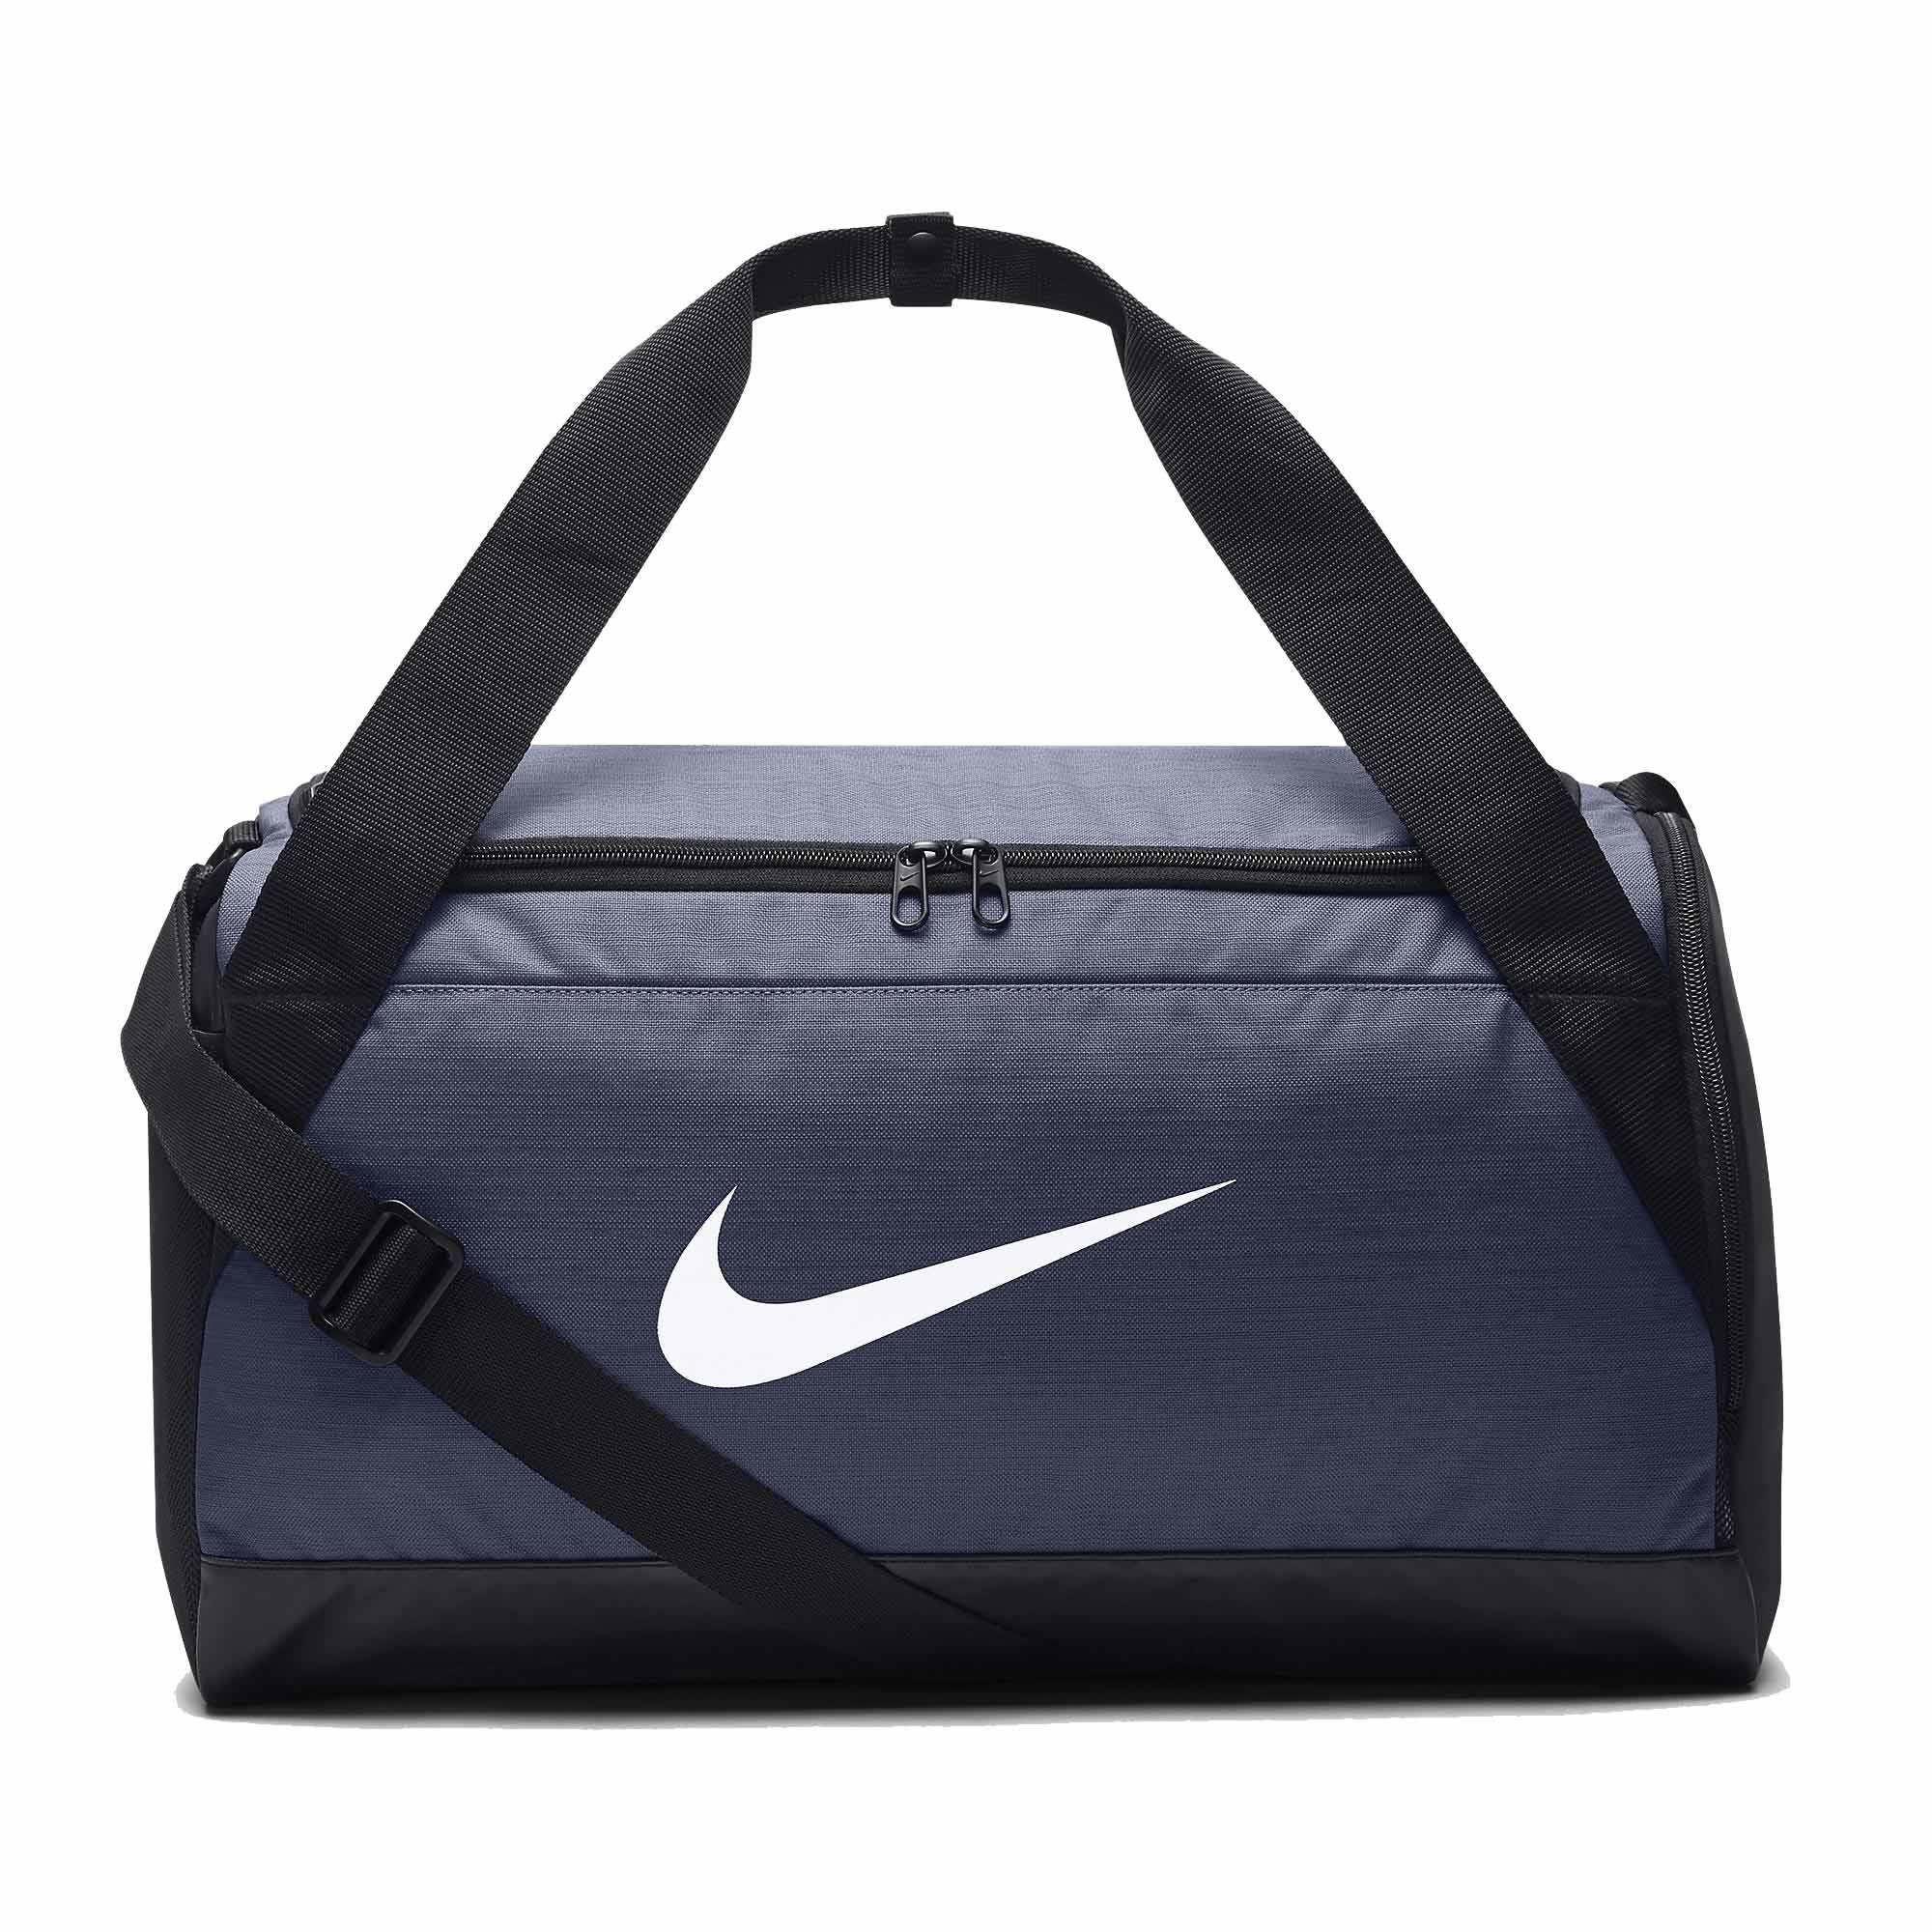 Bolsa Nike Brasilia Duffel Small 40L Azul/Preto  - REAL ESPORTE